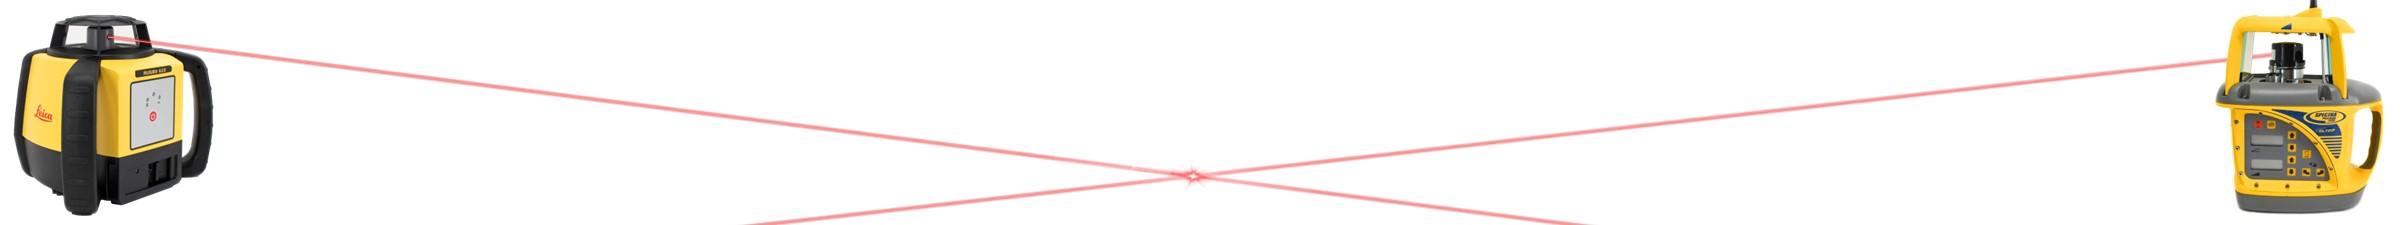 laser-graphic-for-web-edit-2.jpg